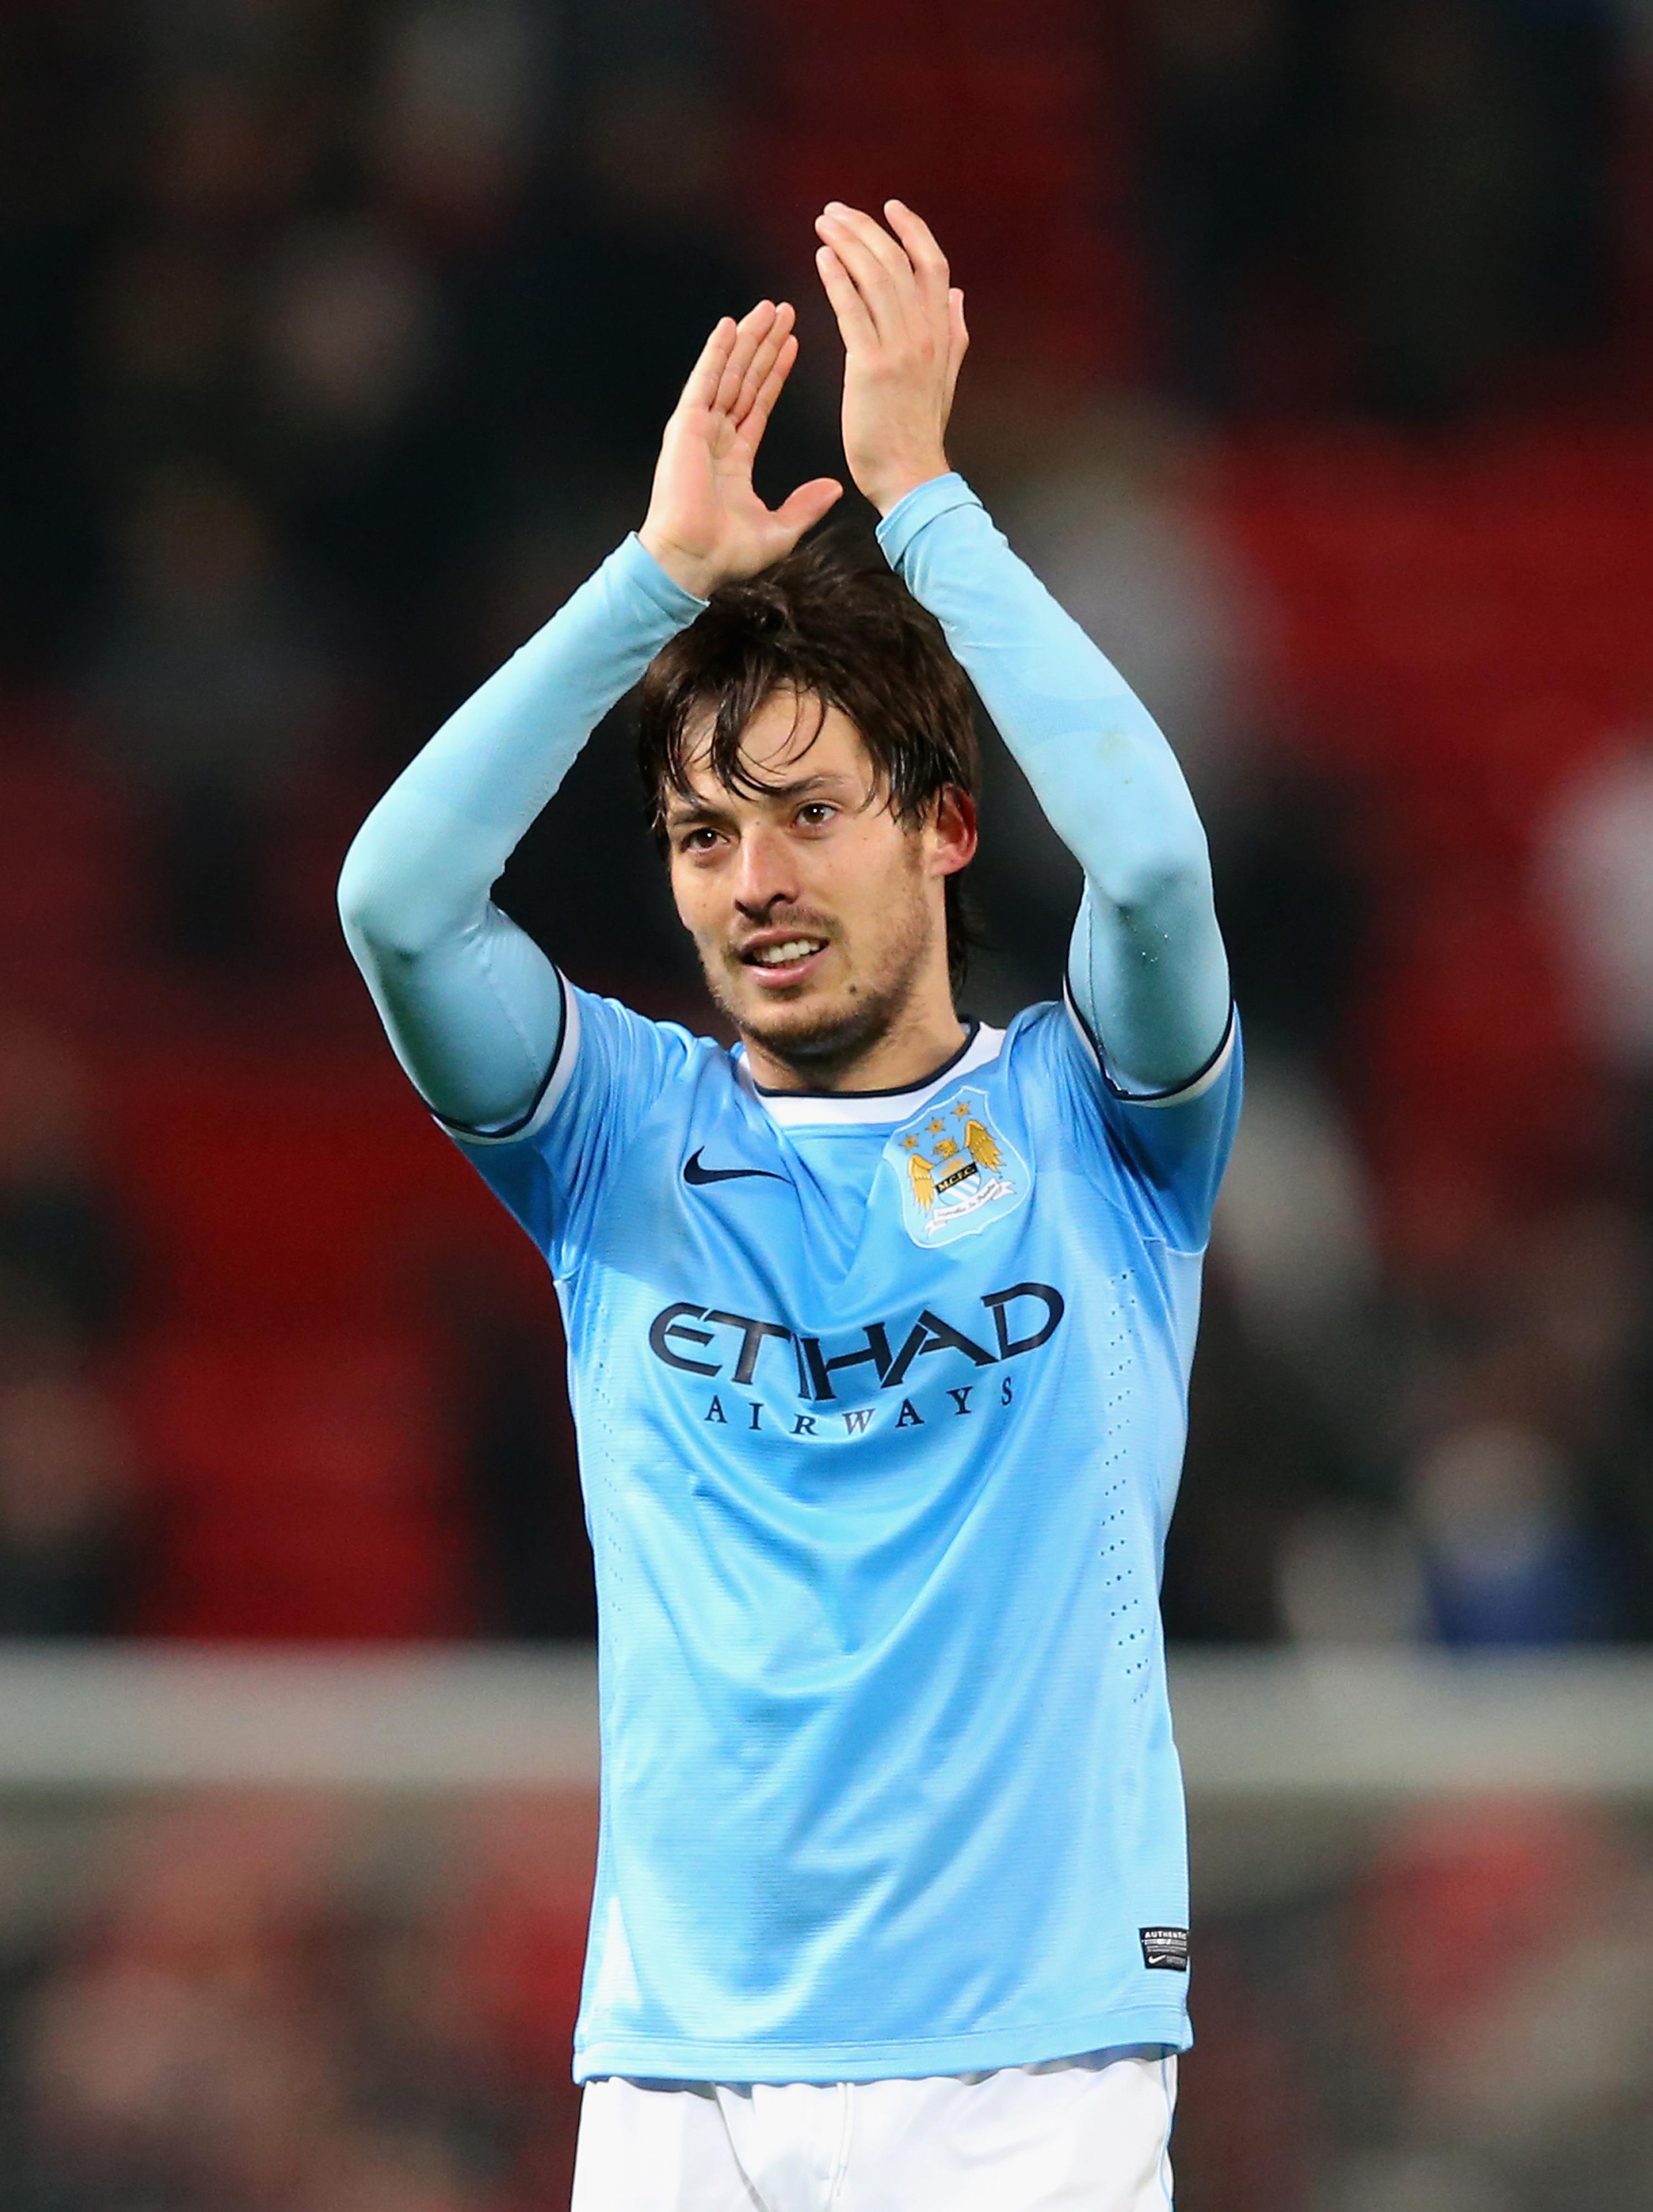 David Silva, aka City's Merlin